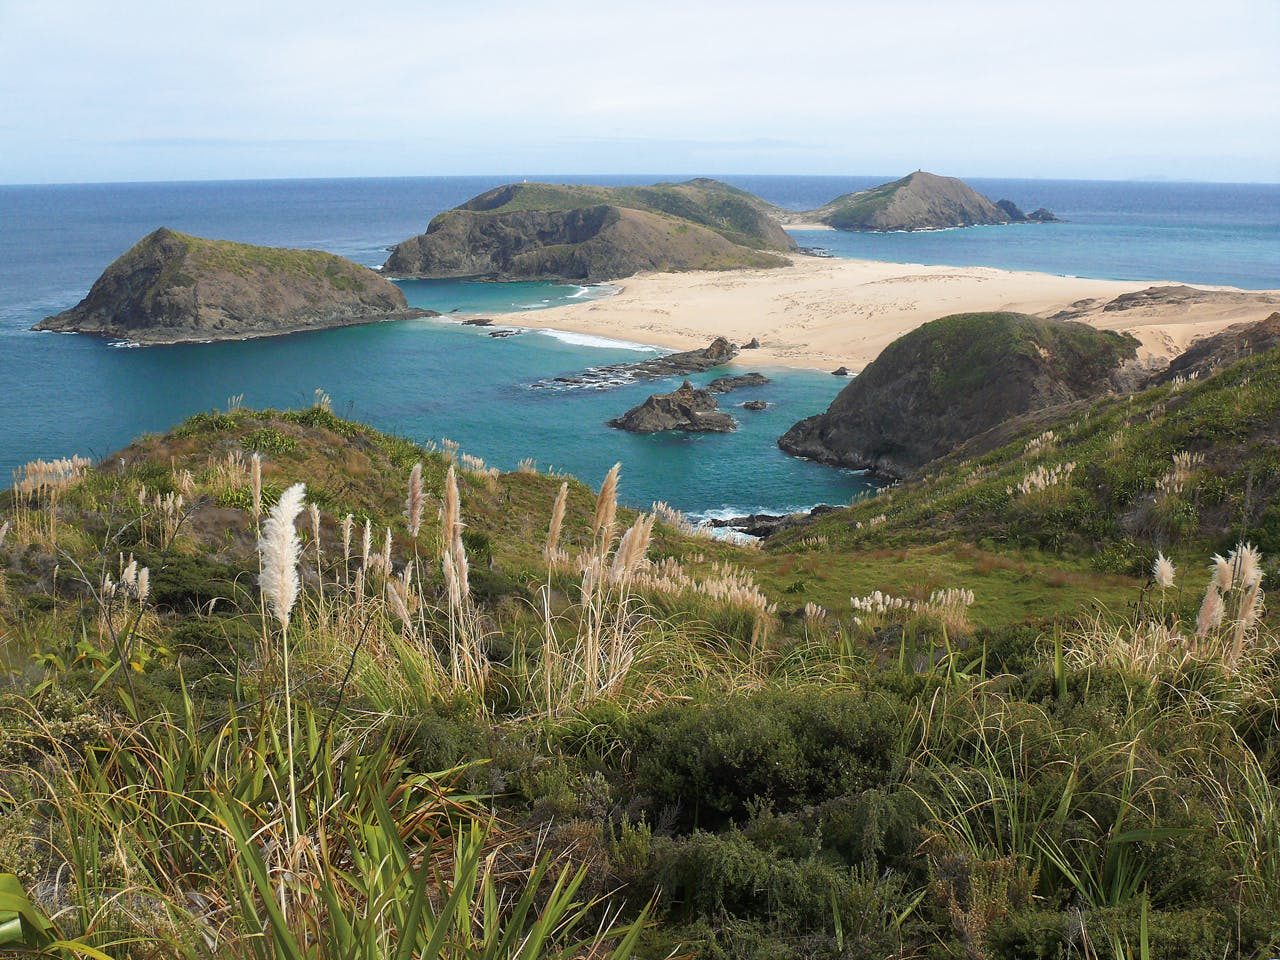 Cape Maria van Diemen with Taupiri Island to the left. Photo: Geoff Spearpoint